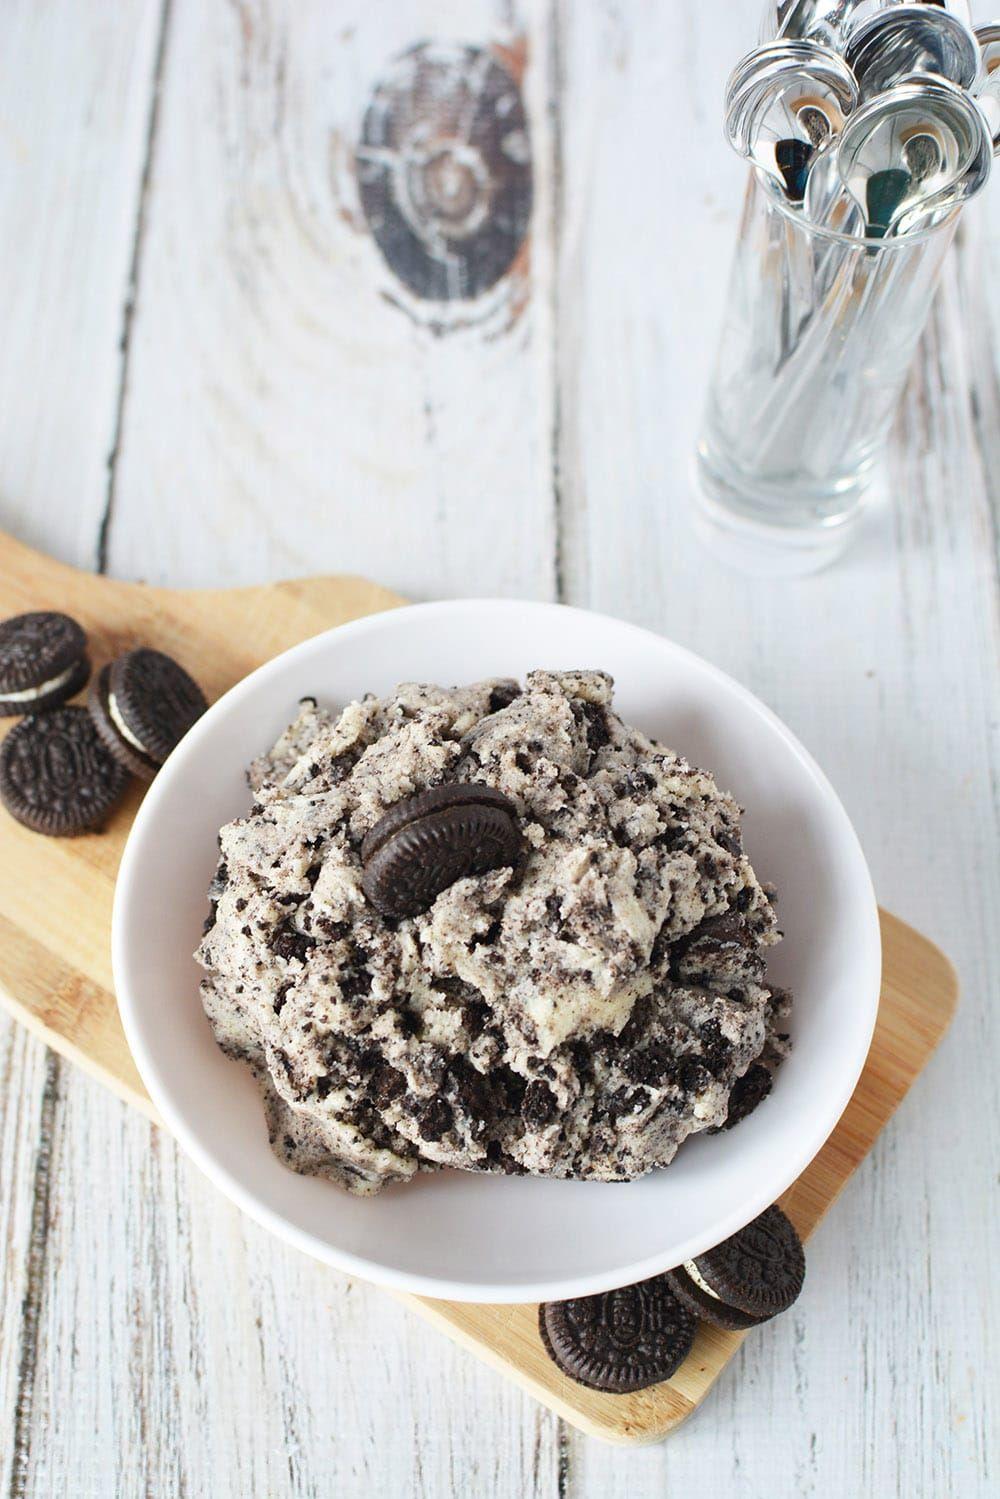 Cookies and Cream Edible Cookie Dough Recipe